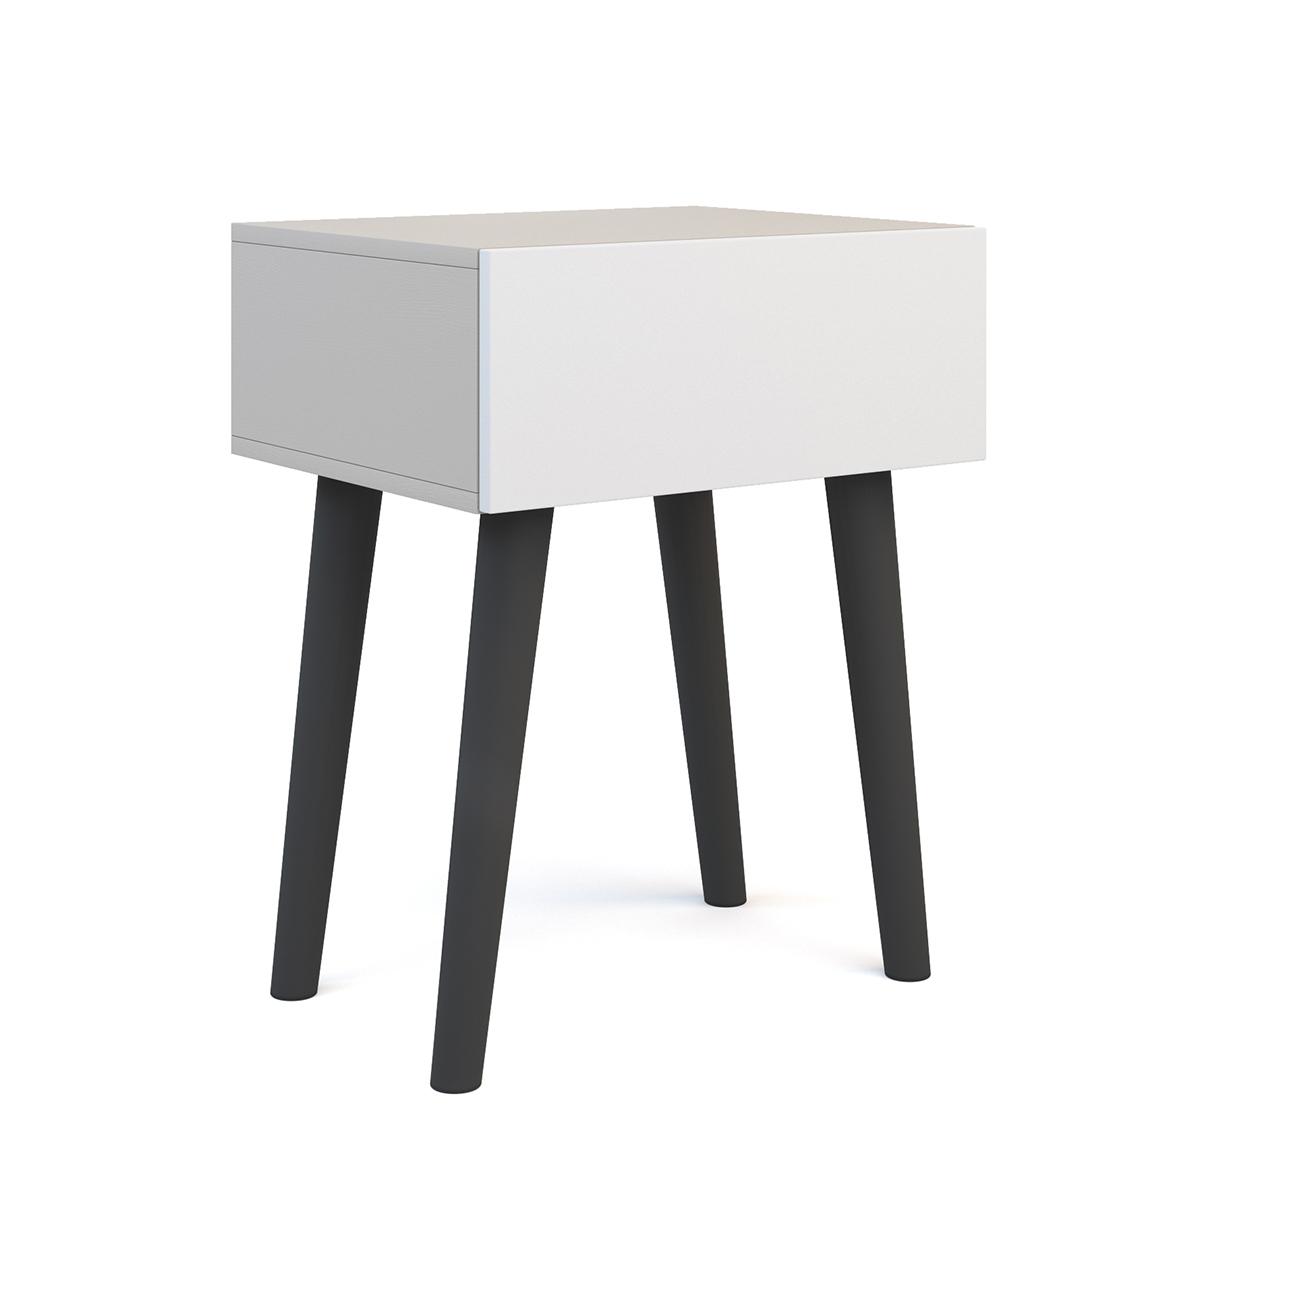 Прикроватная тумба galata soft light (olhause) серый 50x60x40 см.